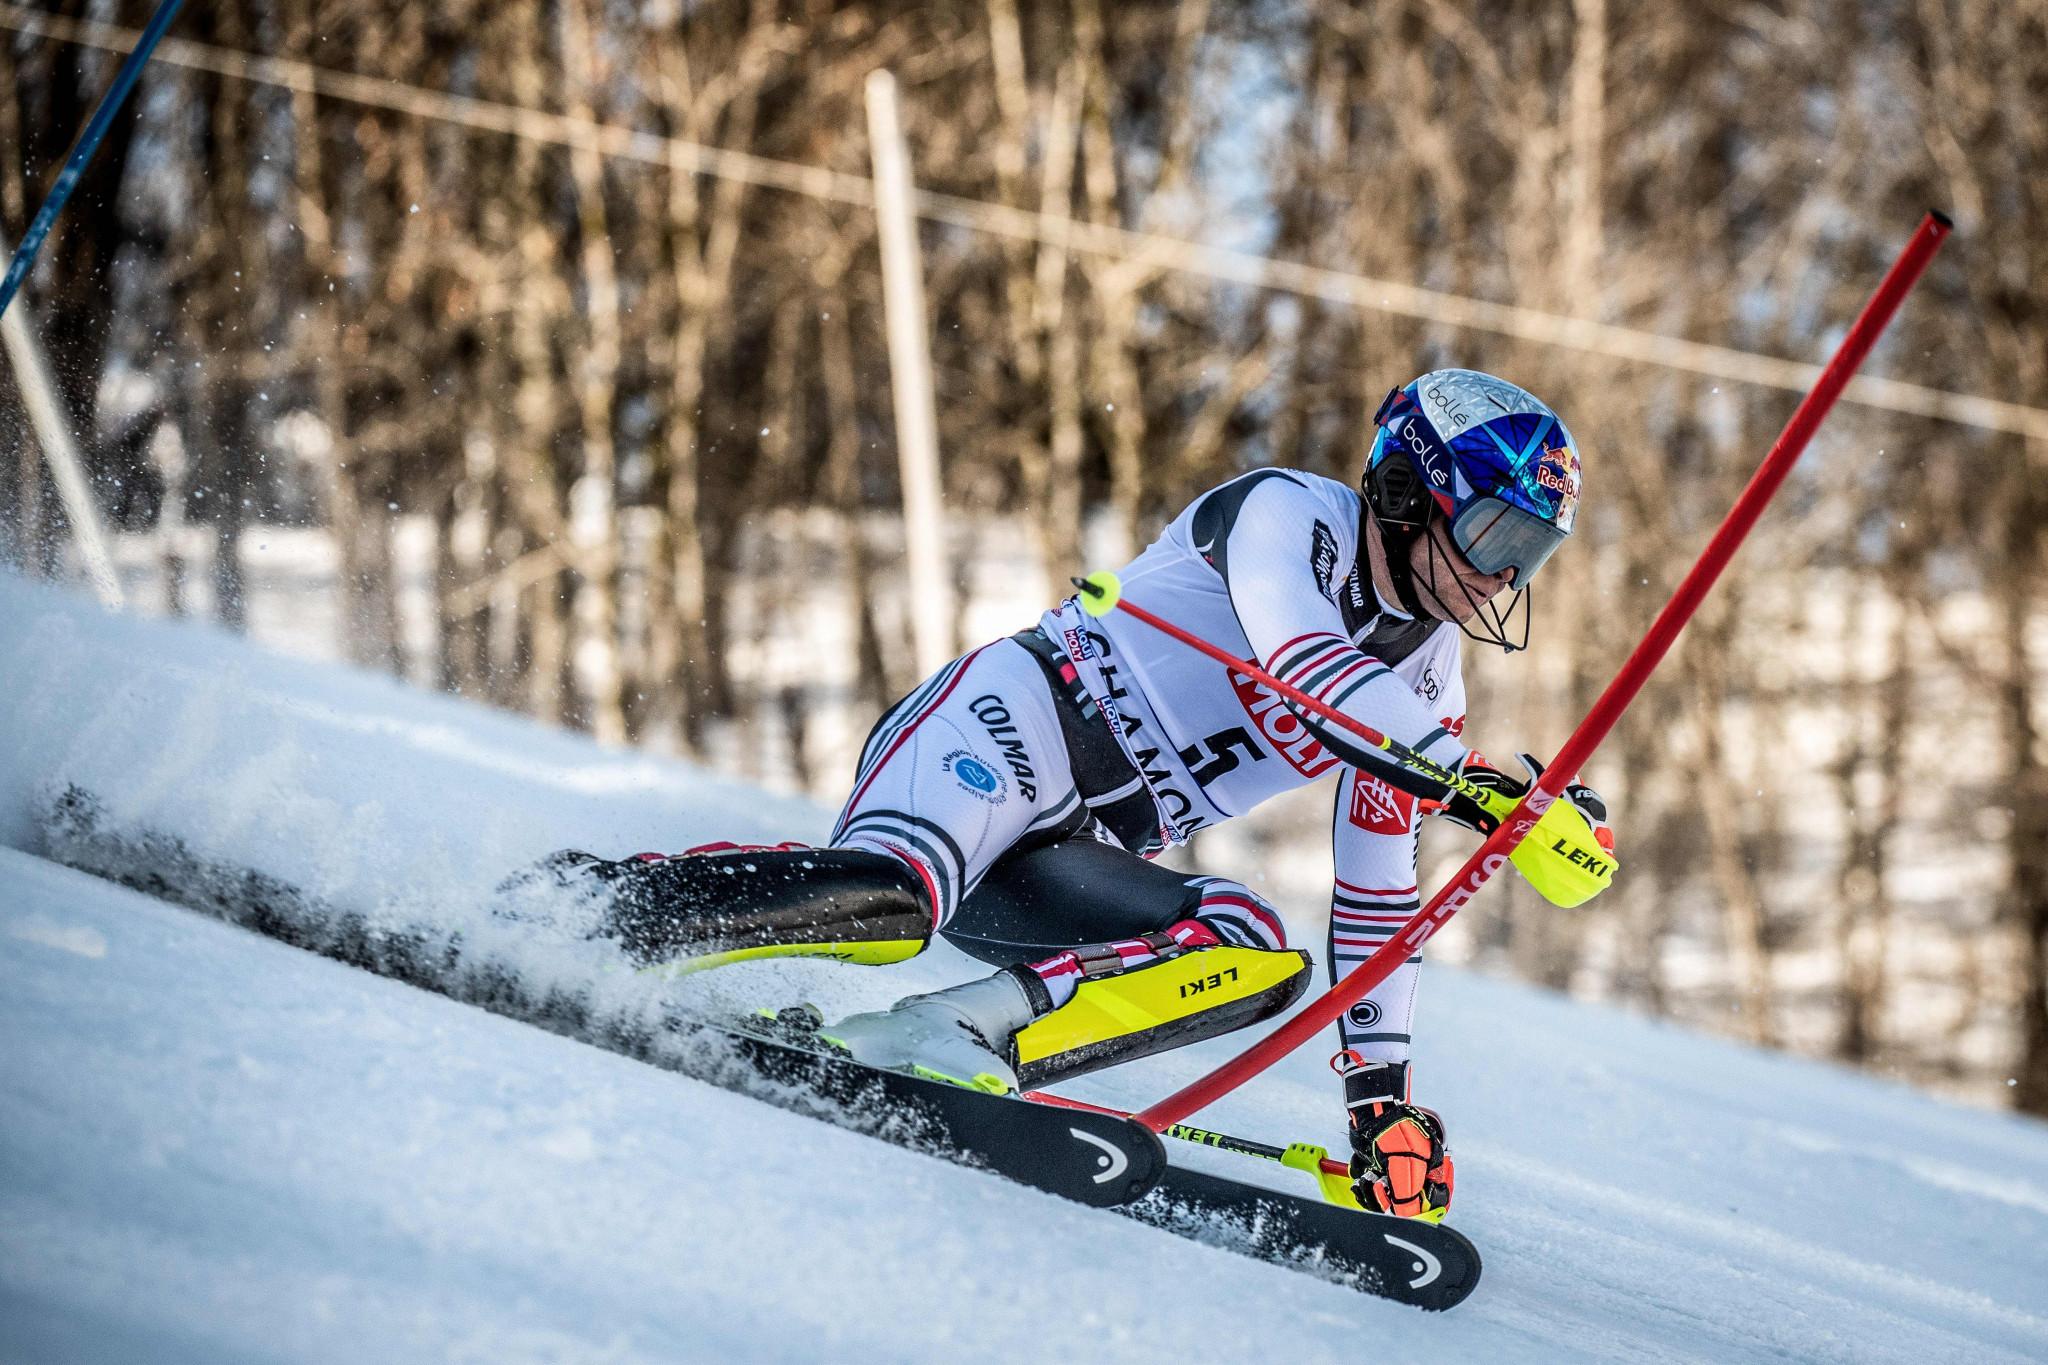 Kristoffersen wins on day of drama at Alpine World Cup in Chamonix